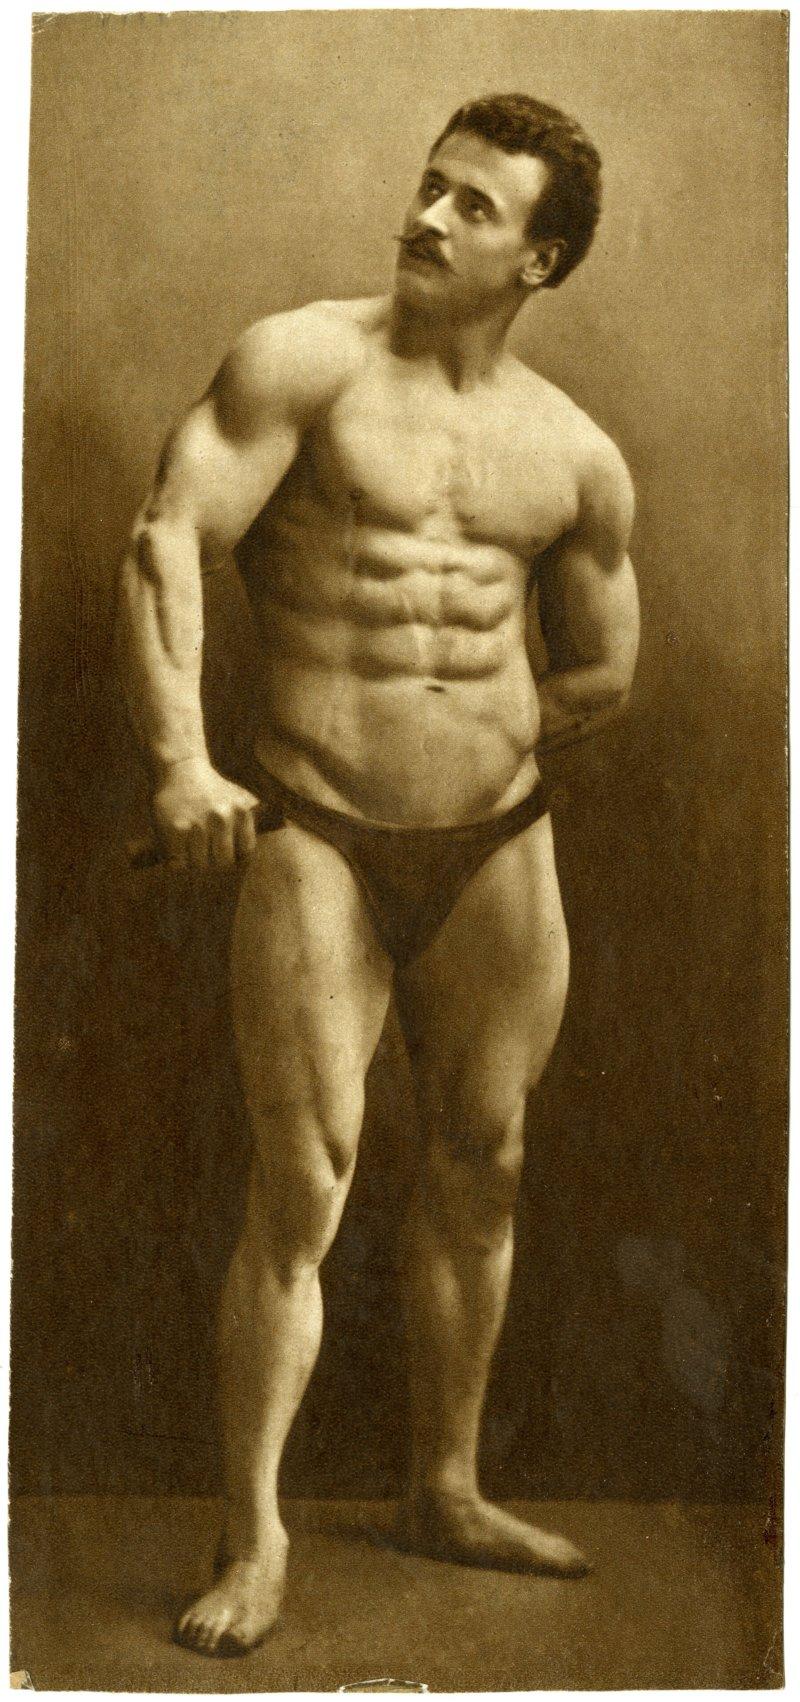 Eugen Sandow abdominal and arm pose | The Index